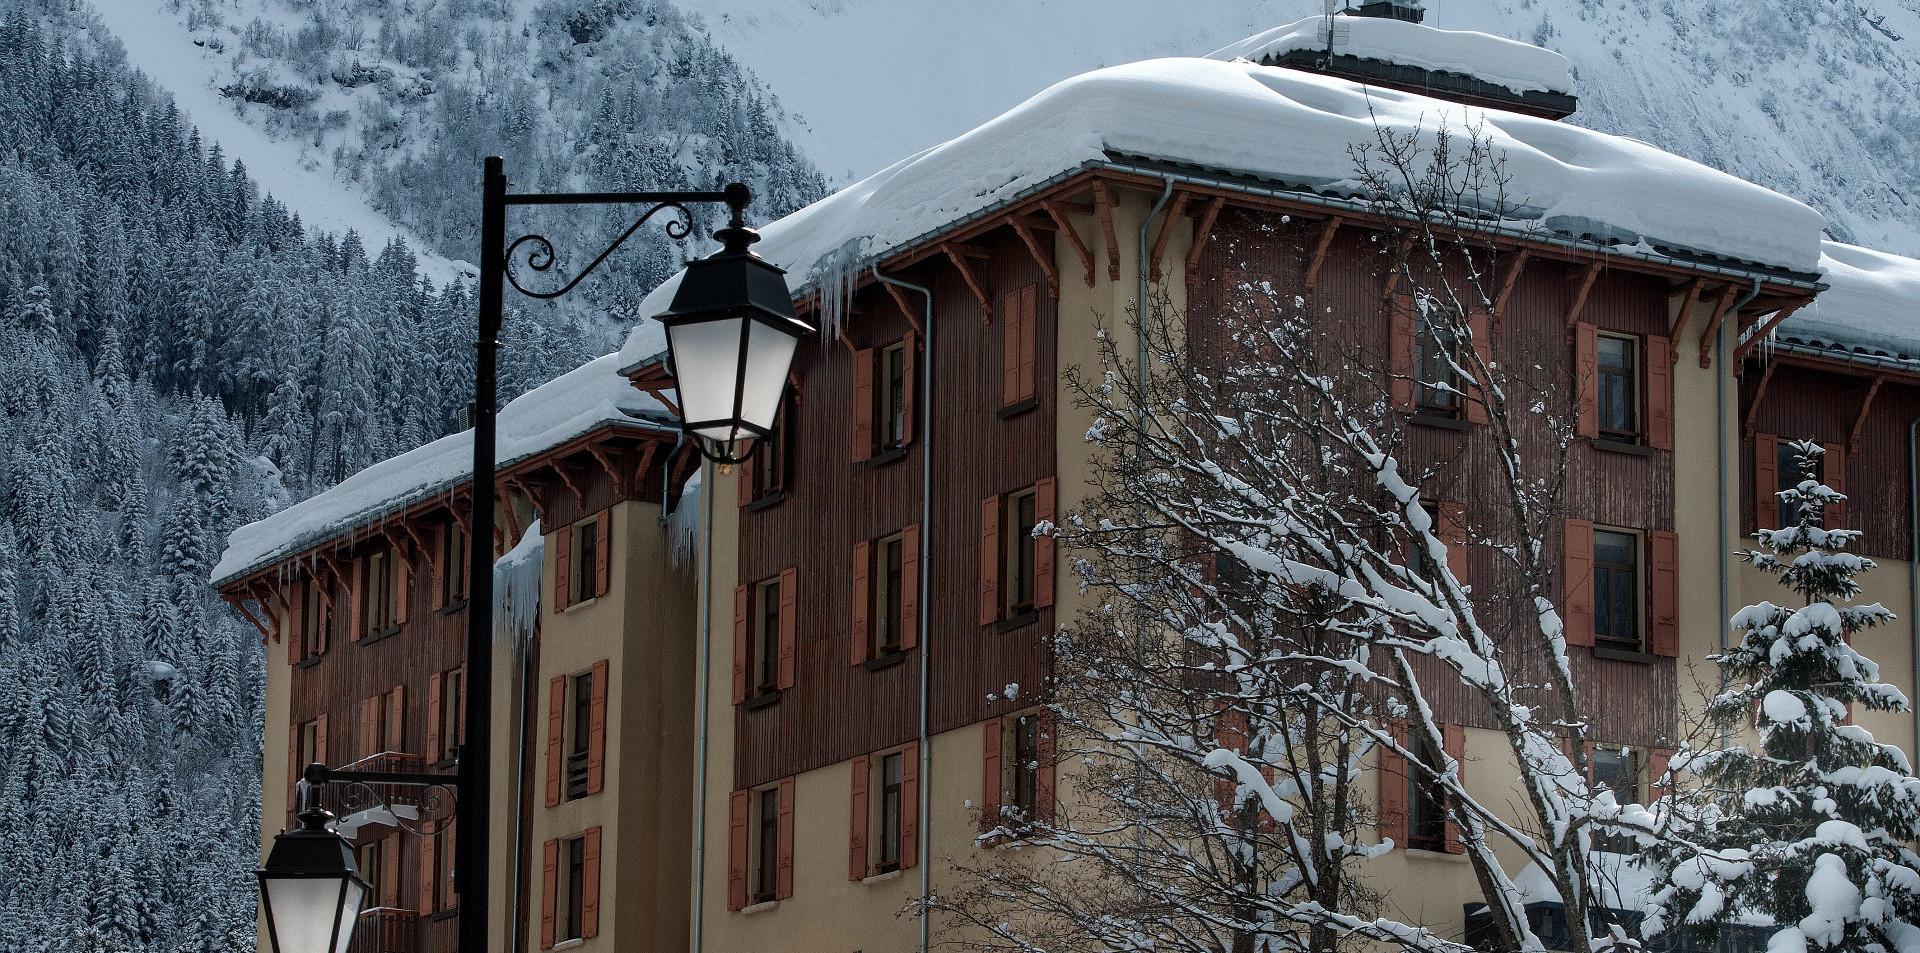 Pralognan-la-Vanoise 9.jpg